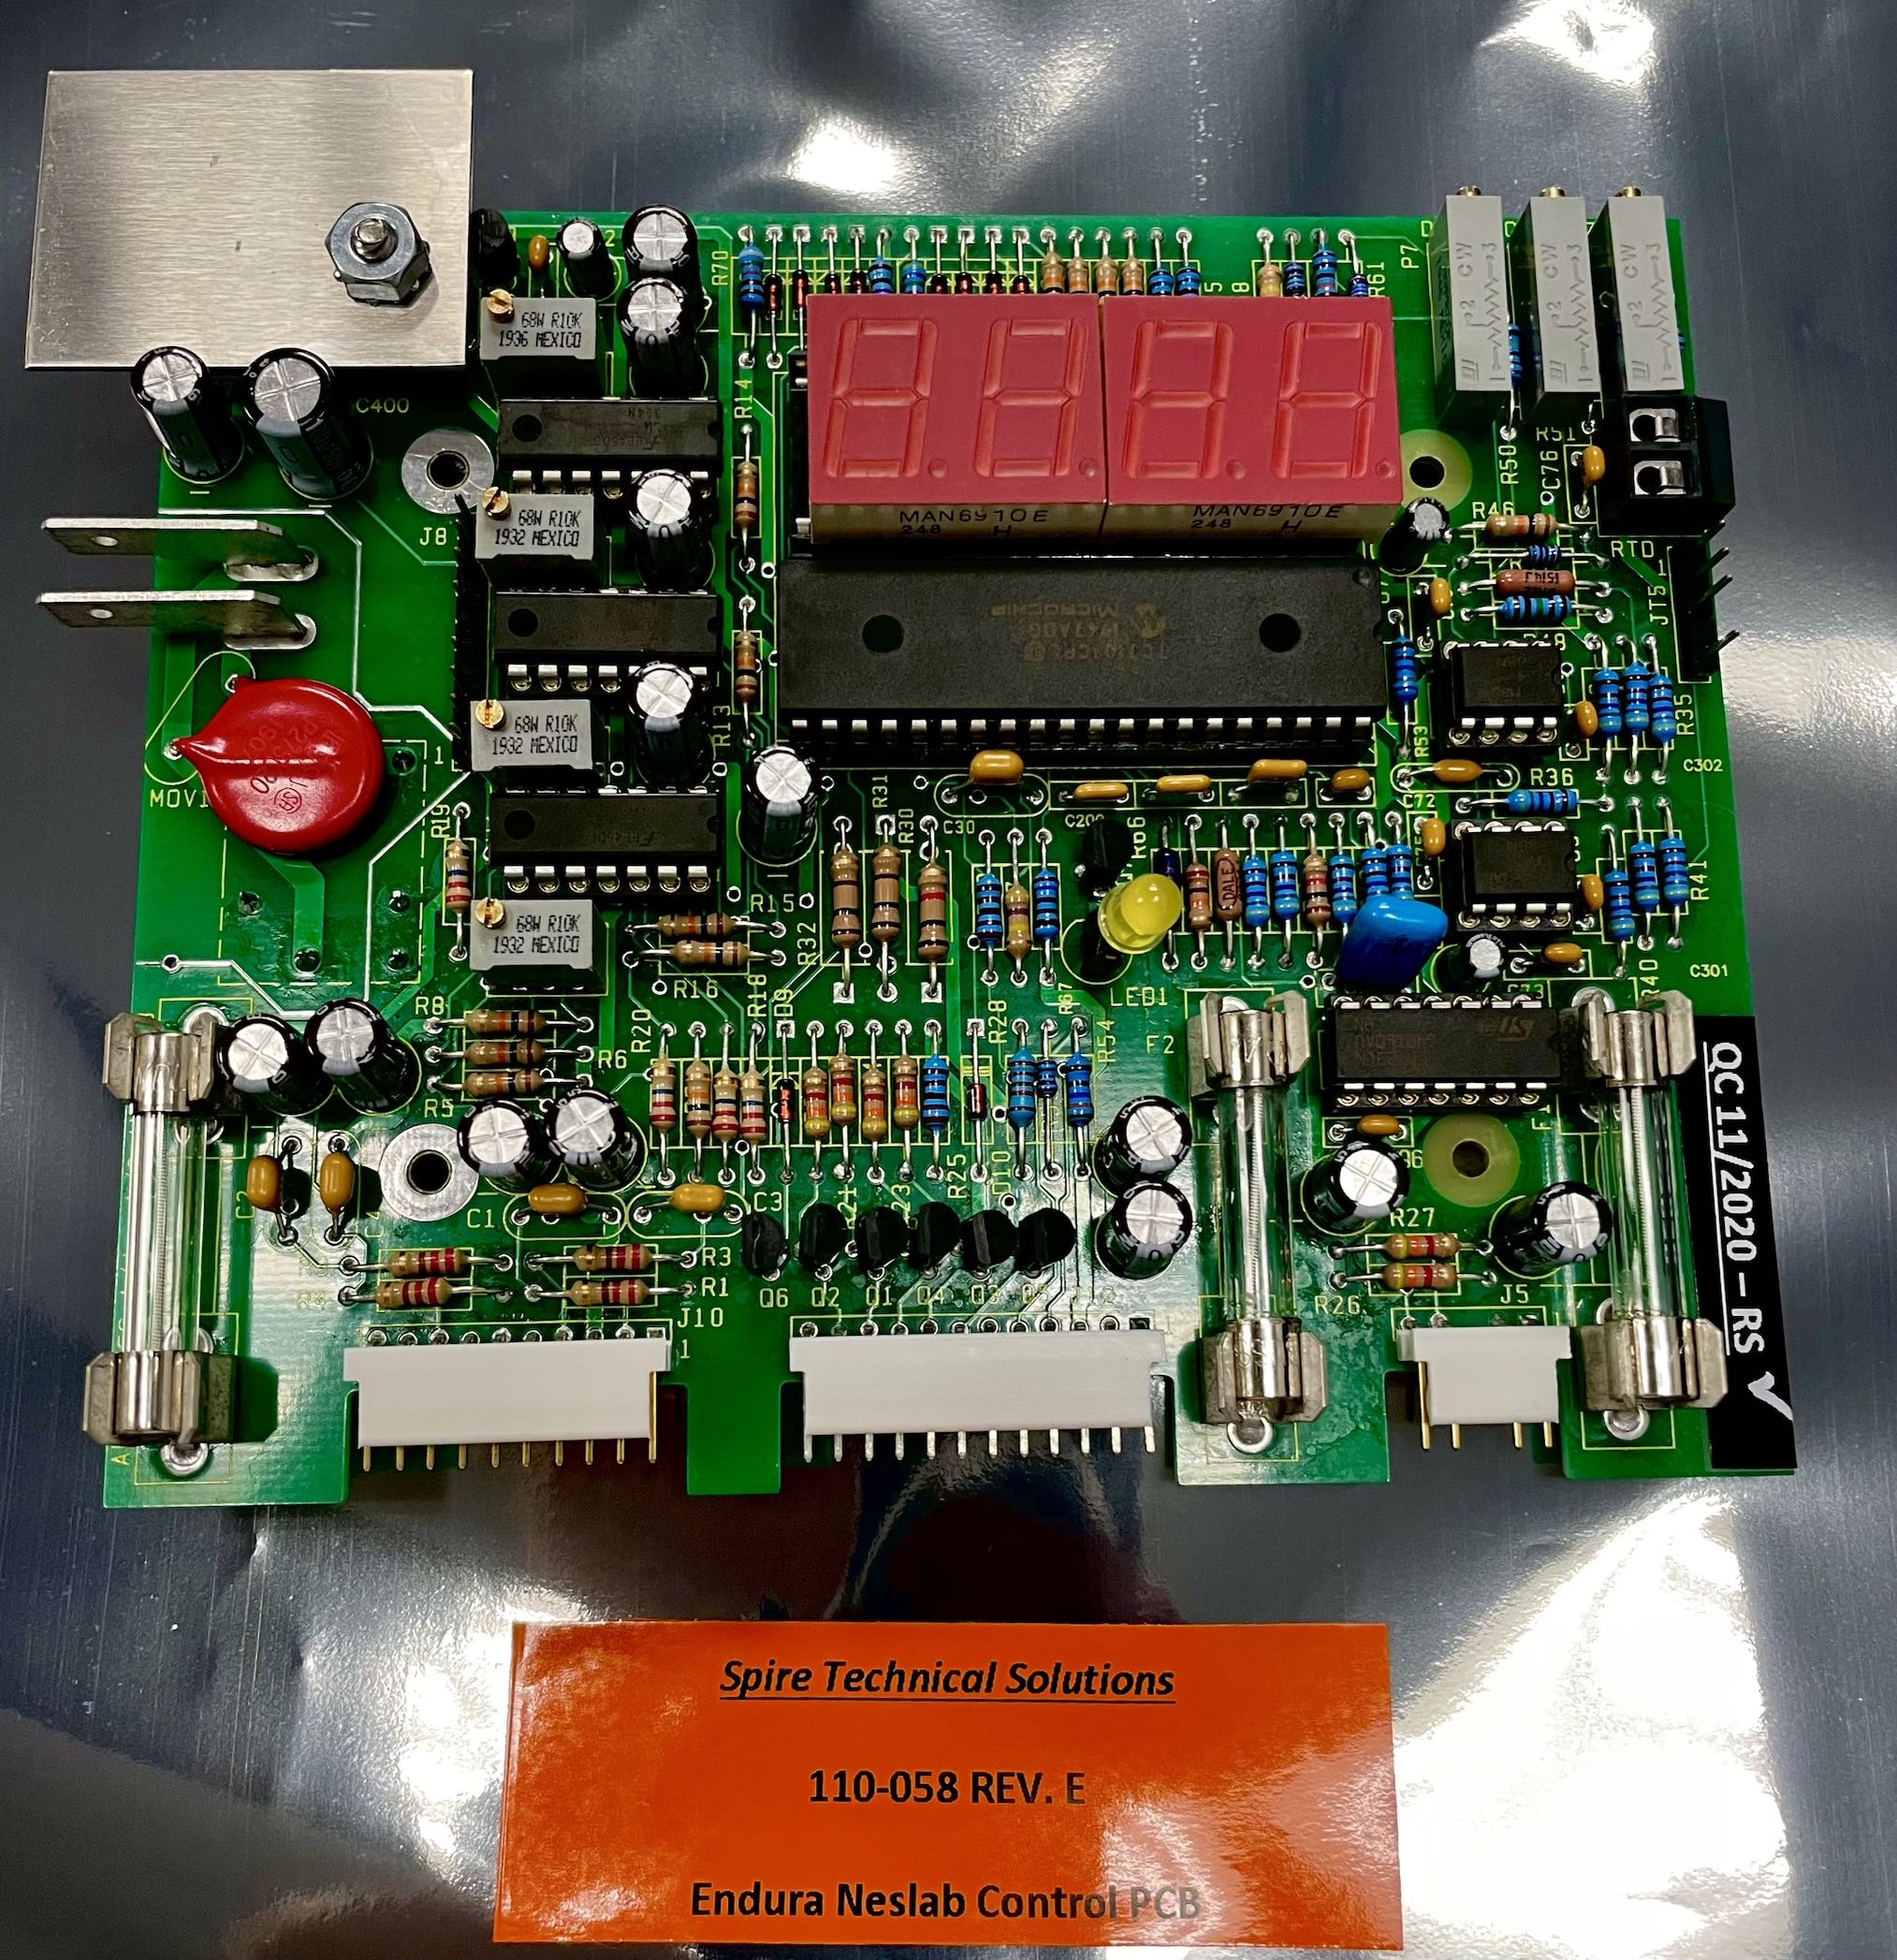 Endura Neslab Control PCB